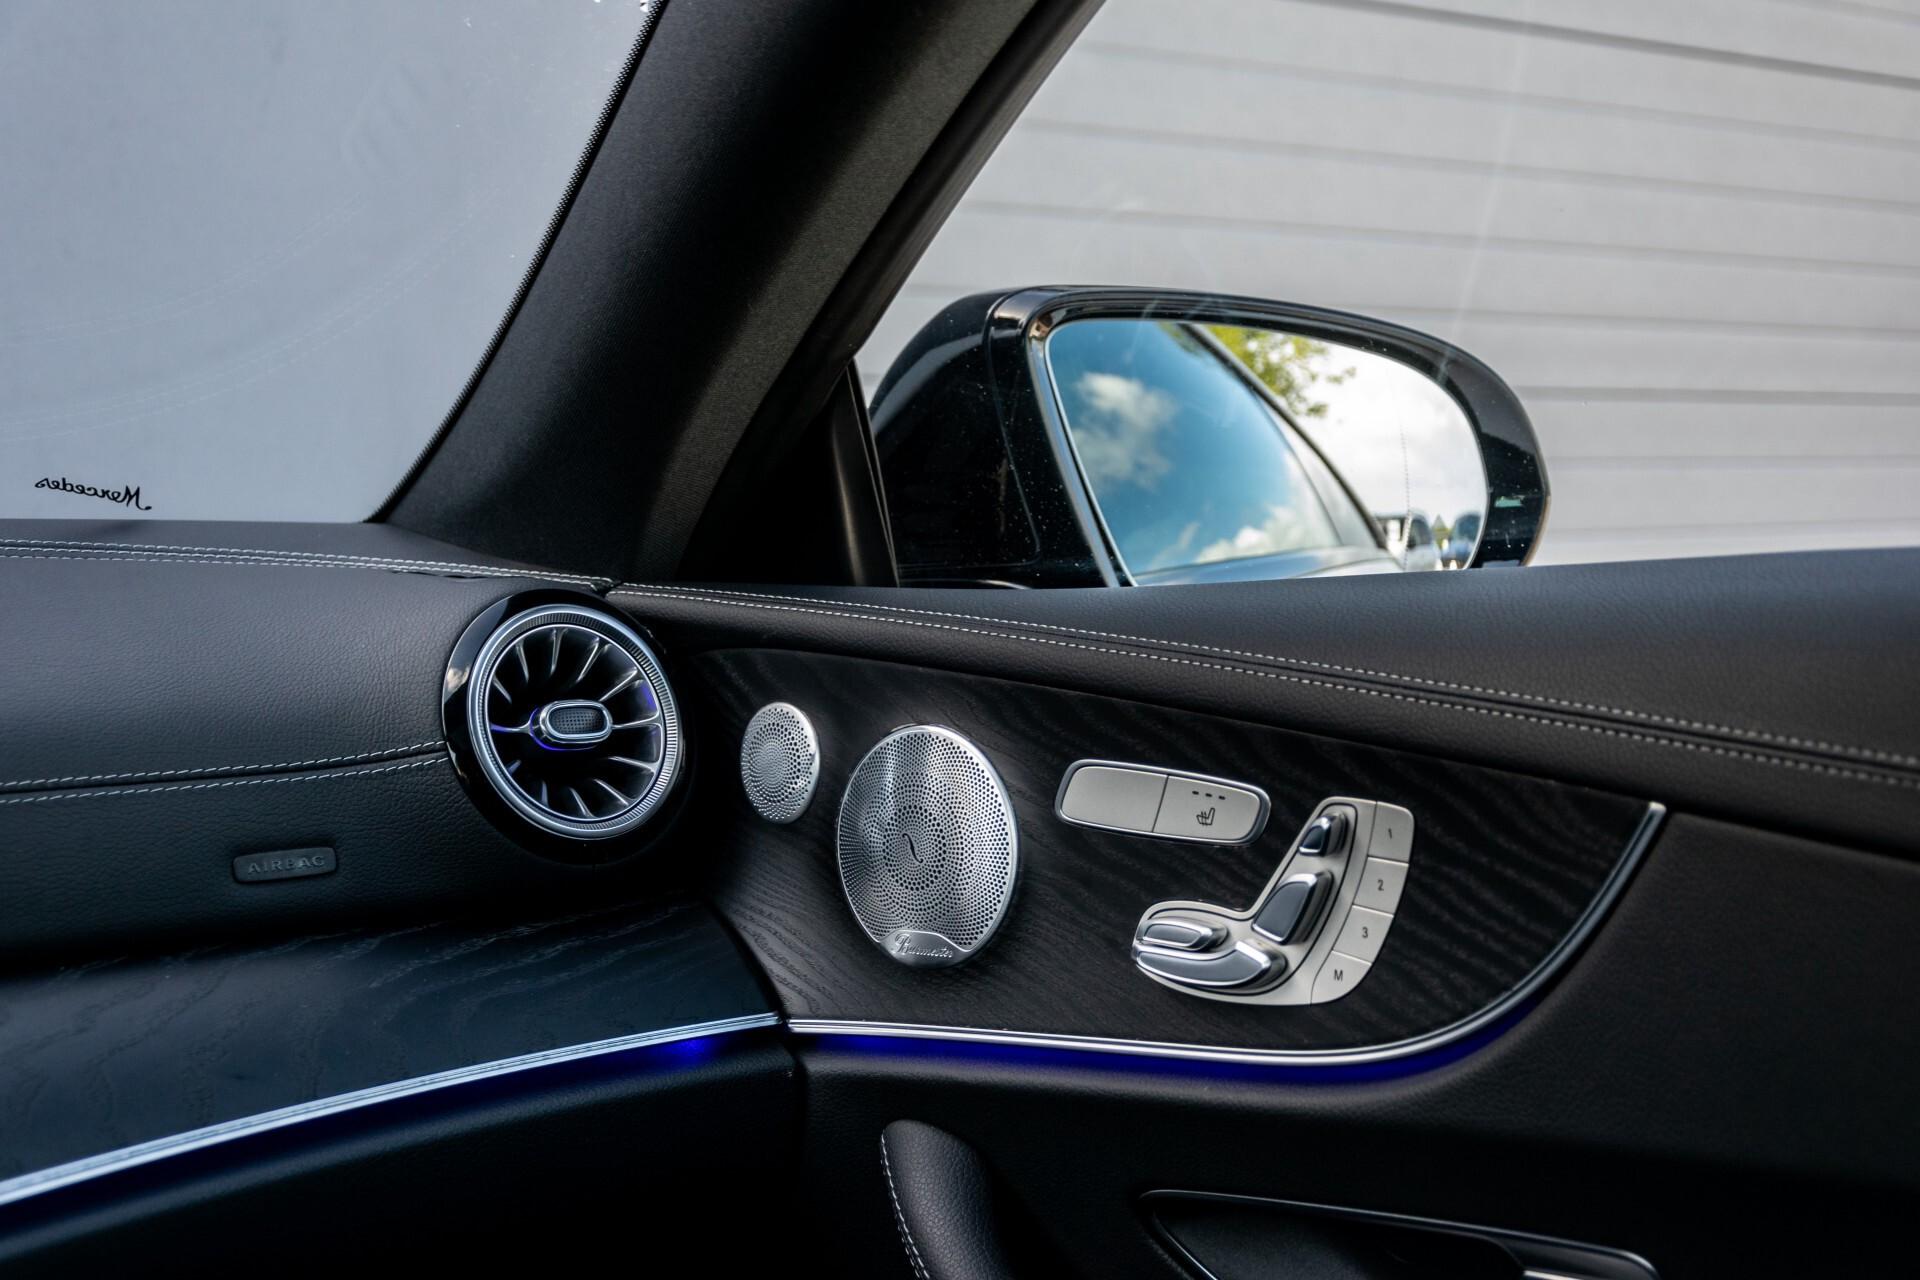 Mercedes-Benz E-Klasse Coupé 300 AMG Panorama/Rij-assist/Keyless/Massage/Memory/HUD/Standkachel/Night Aut9 Foto 48